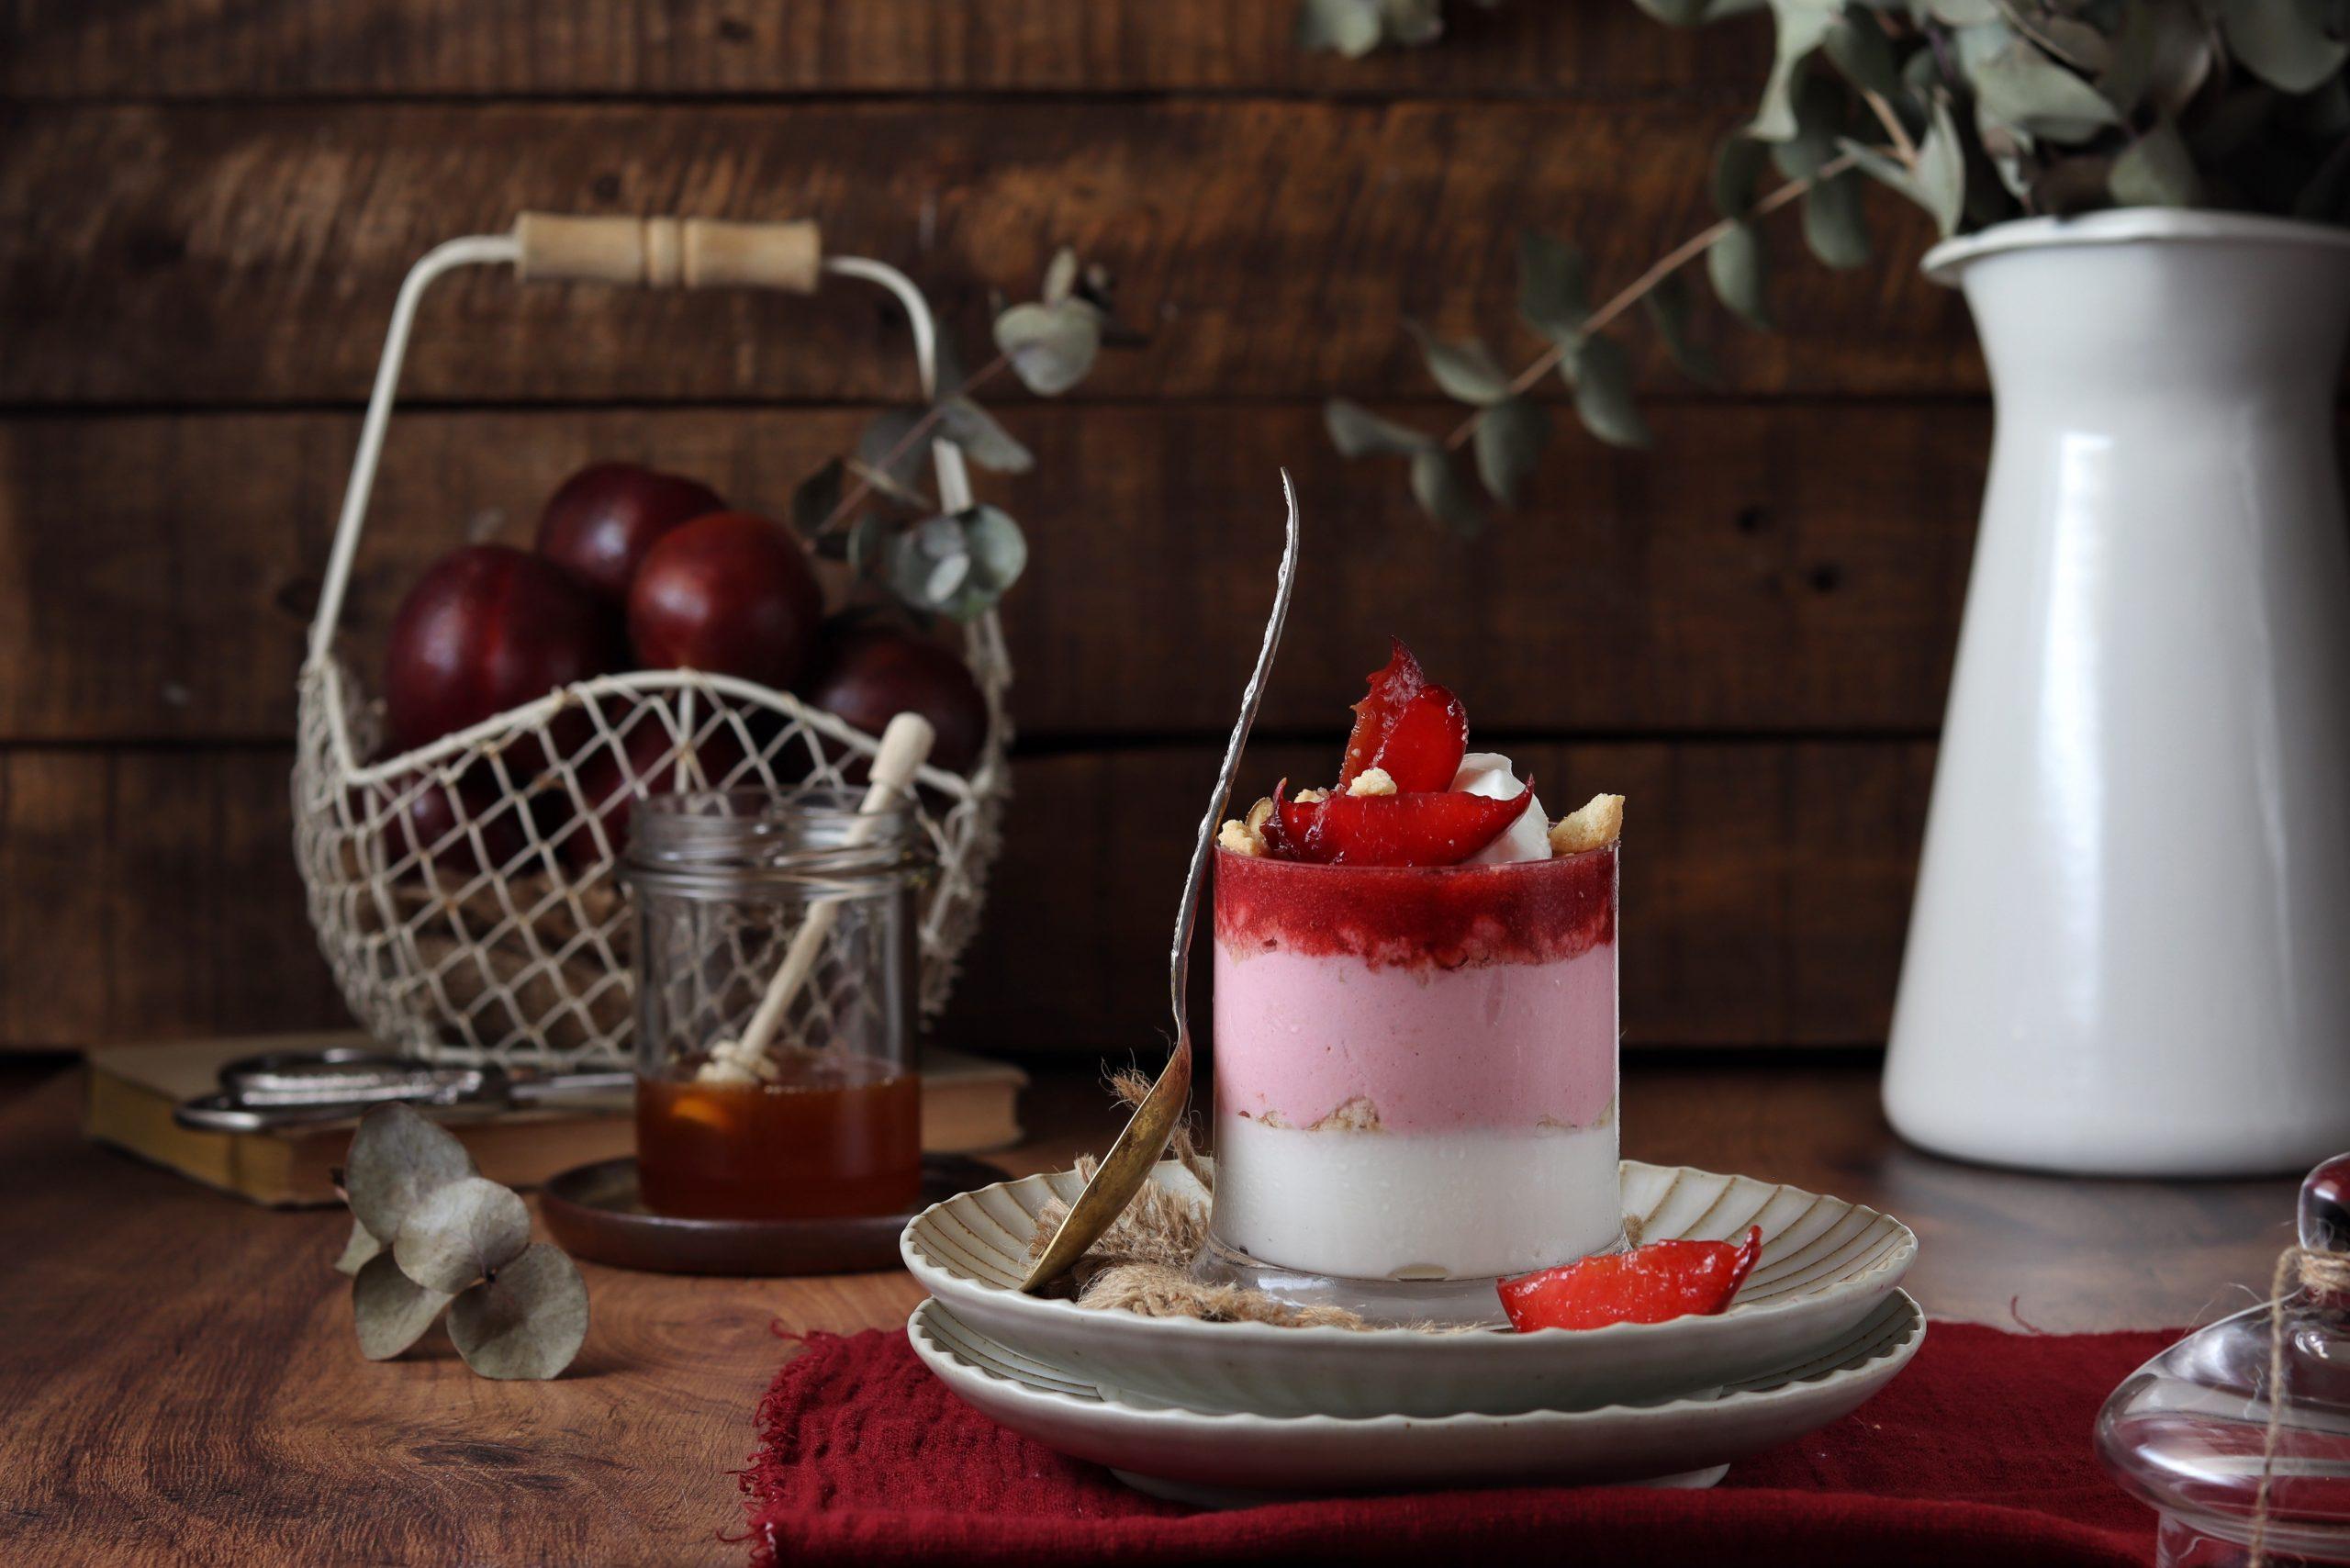 Coppa di yogurt, susine rosse e miele